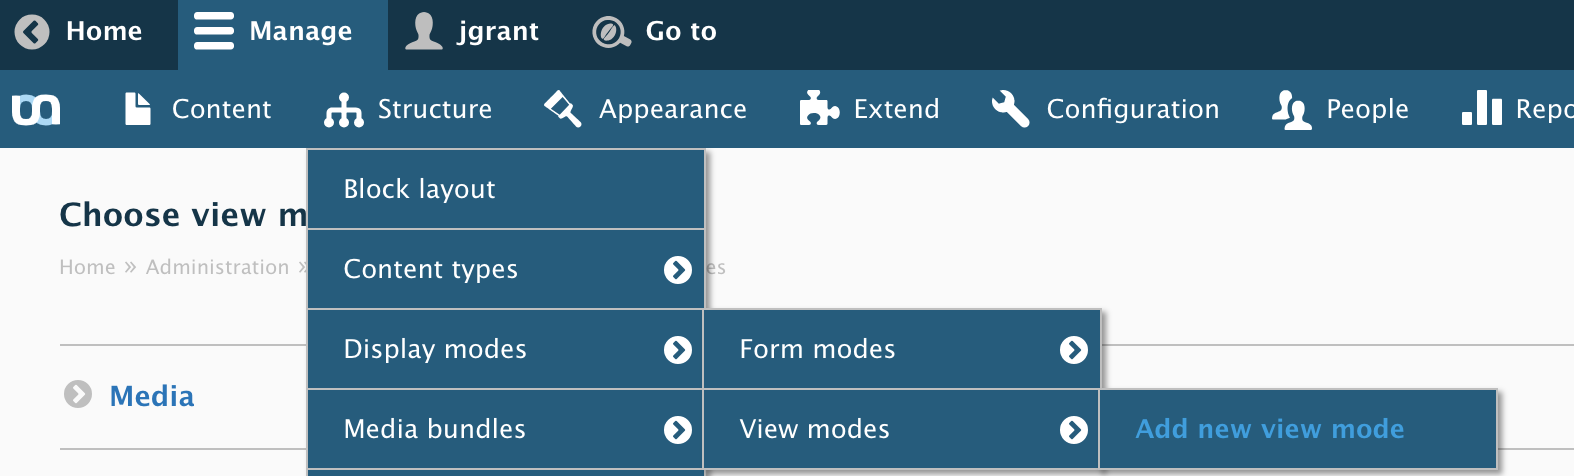 Emulsify - Manage display setting